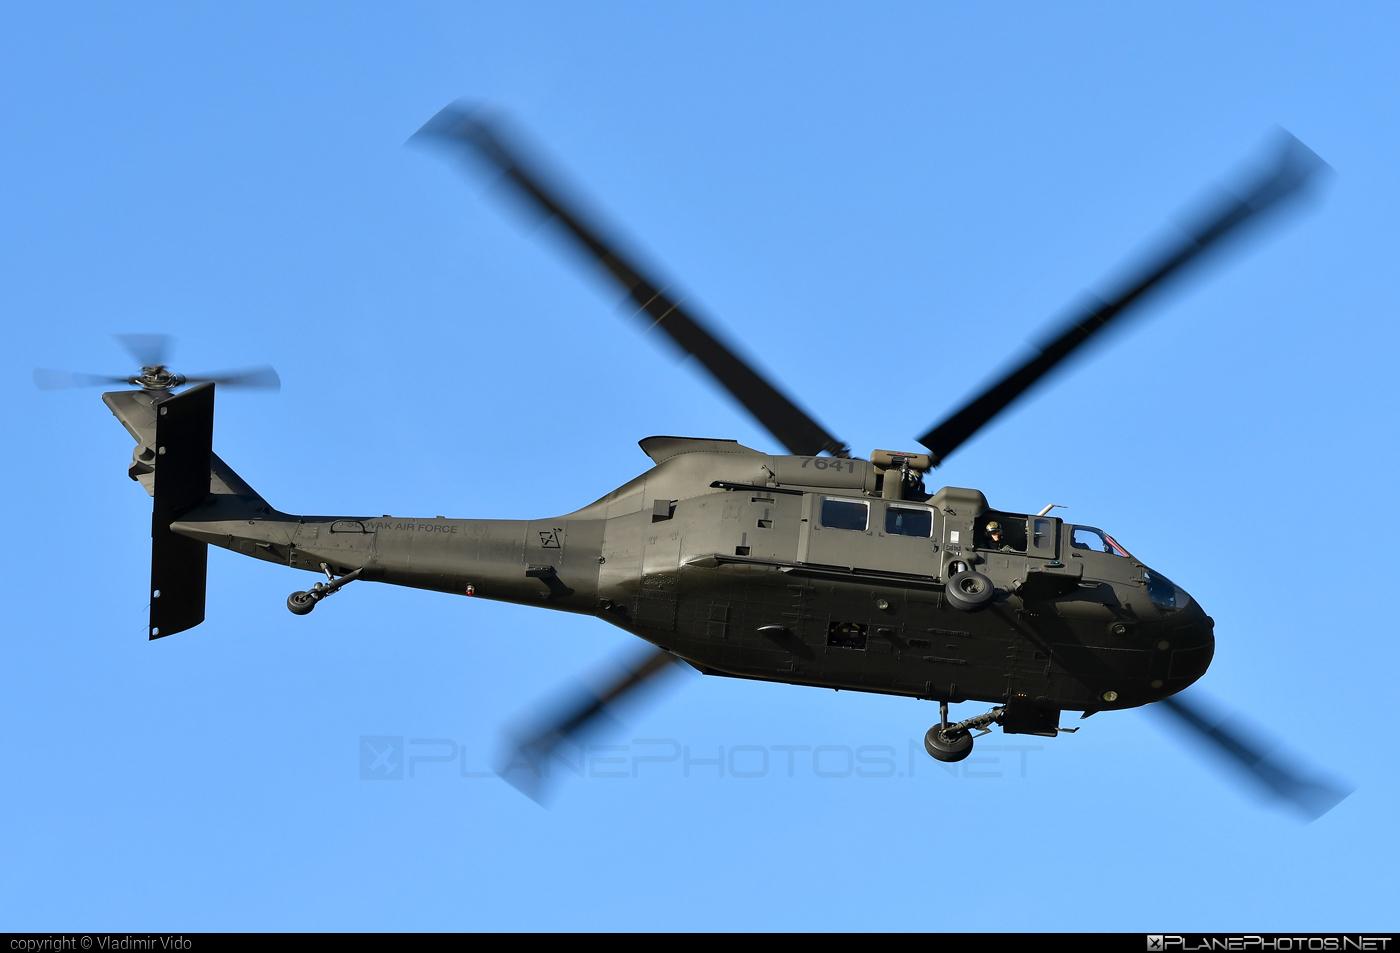 Sikorsky UH-60M Black Hawk - 7641 operated by Vzdušné sily OS SR (Slovak Air Force) #blackhawk #sikorsky #slovakairforce #uh60 #uh60blackhawk #uh60m #vzdusnesilyossr